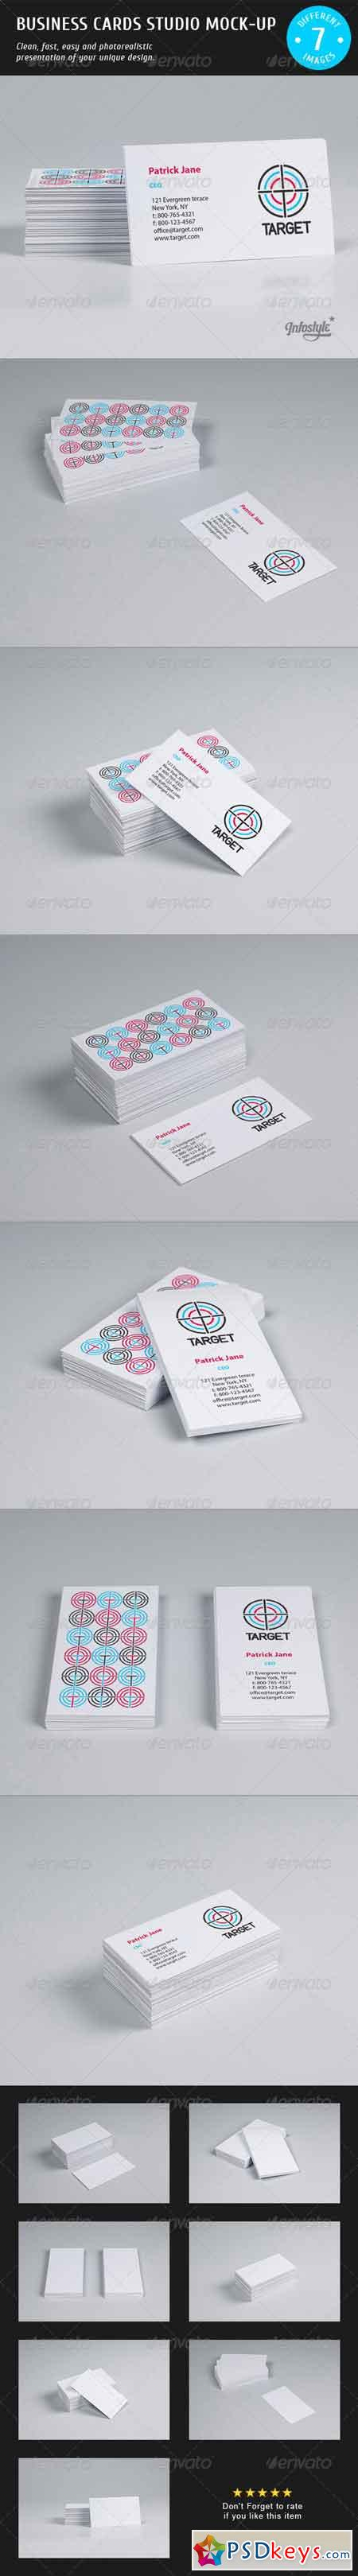 Business Cards Studio Mock-up 3892218 » Free Download Photoshop ...